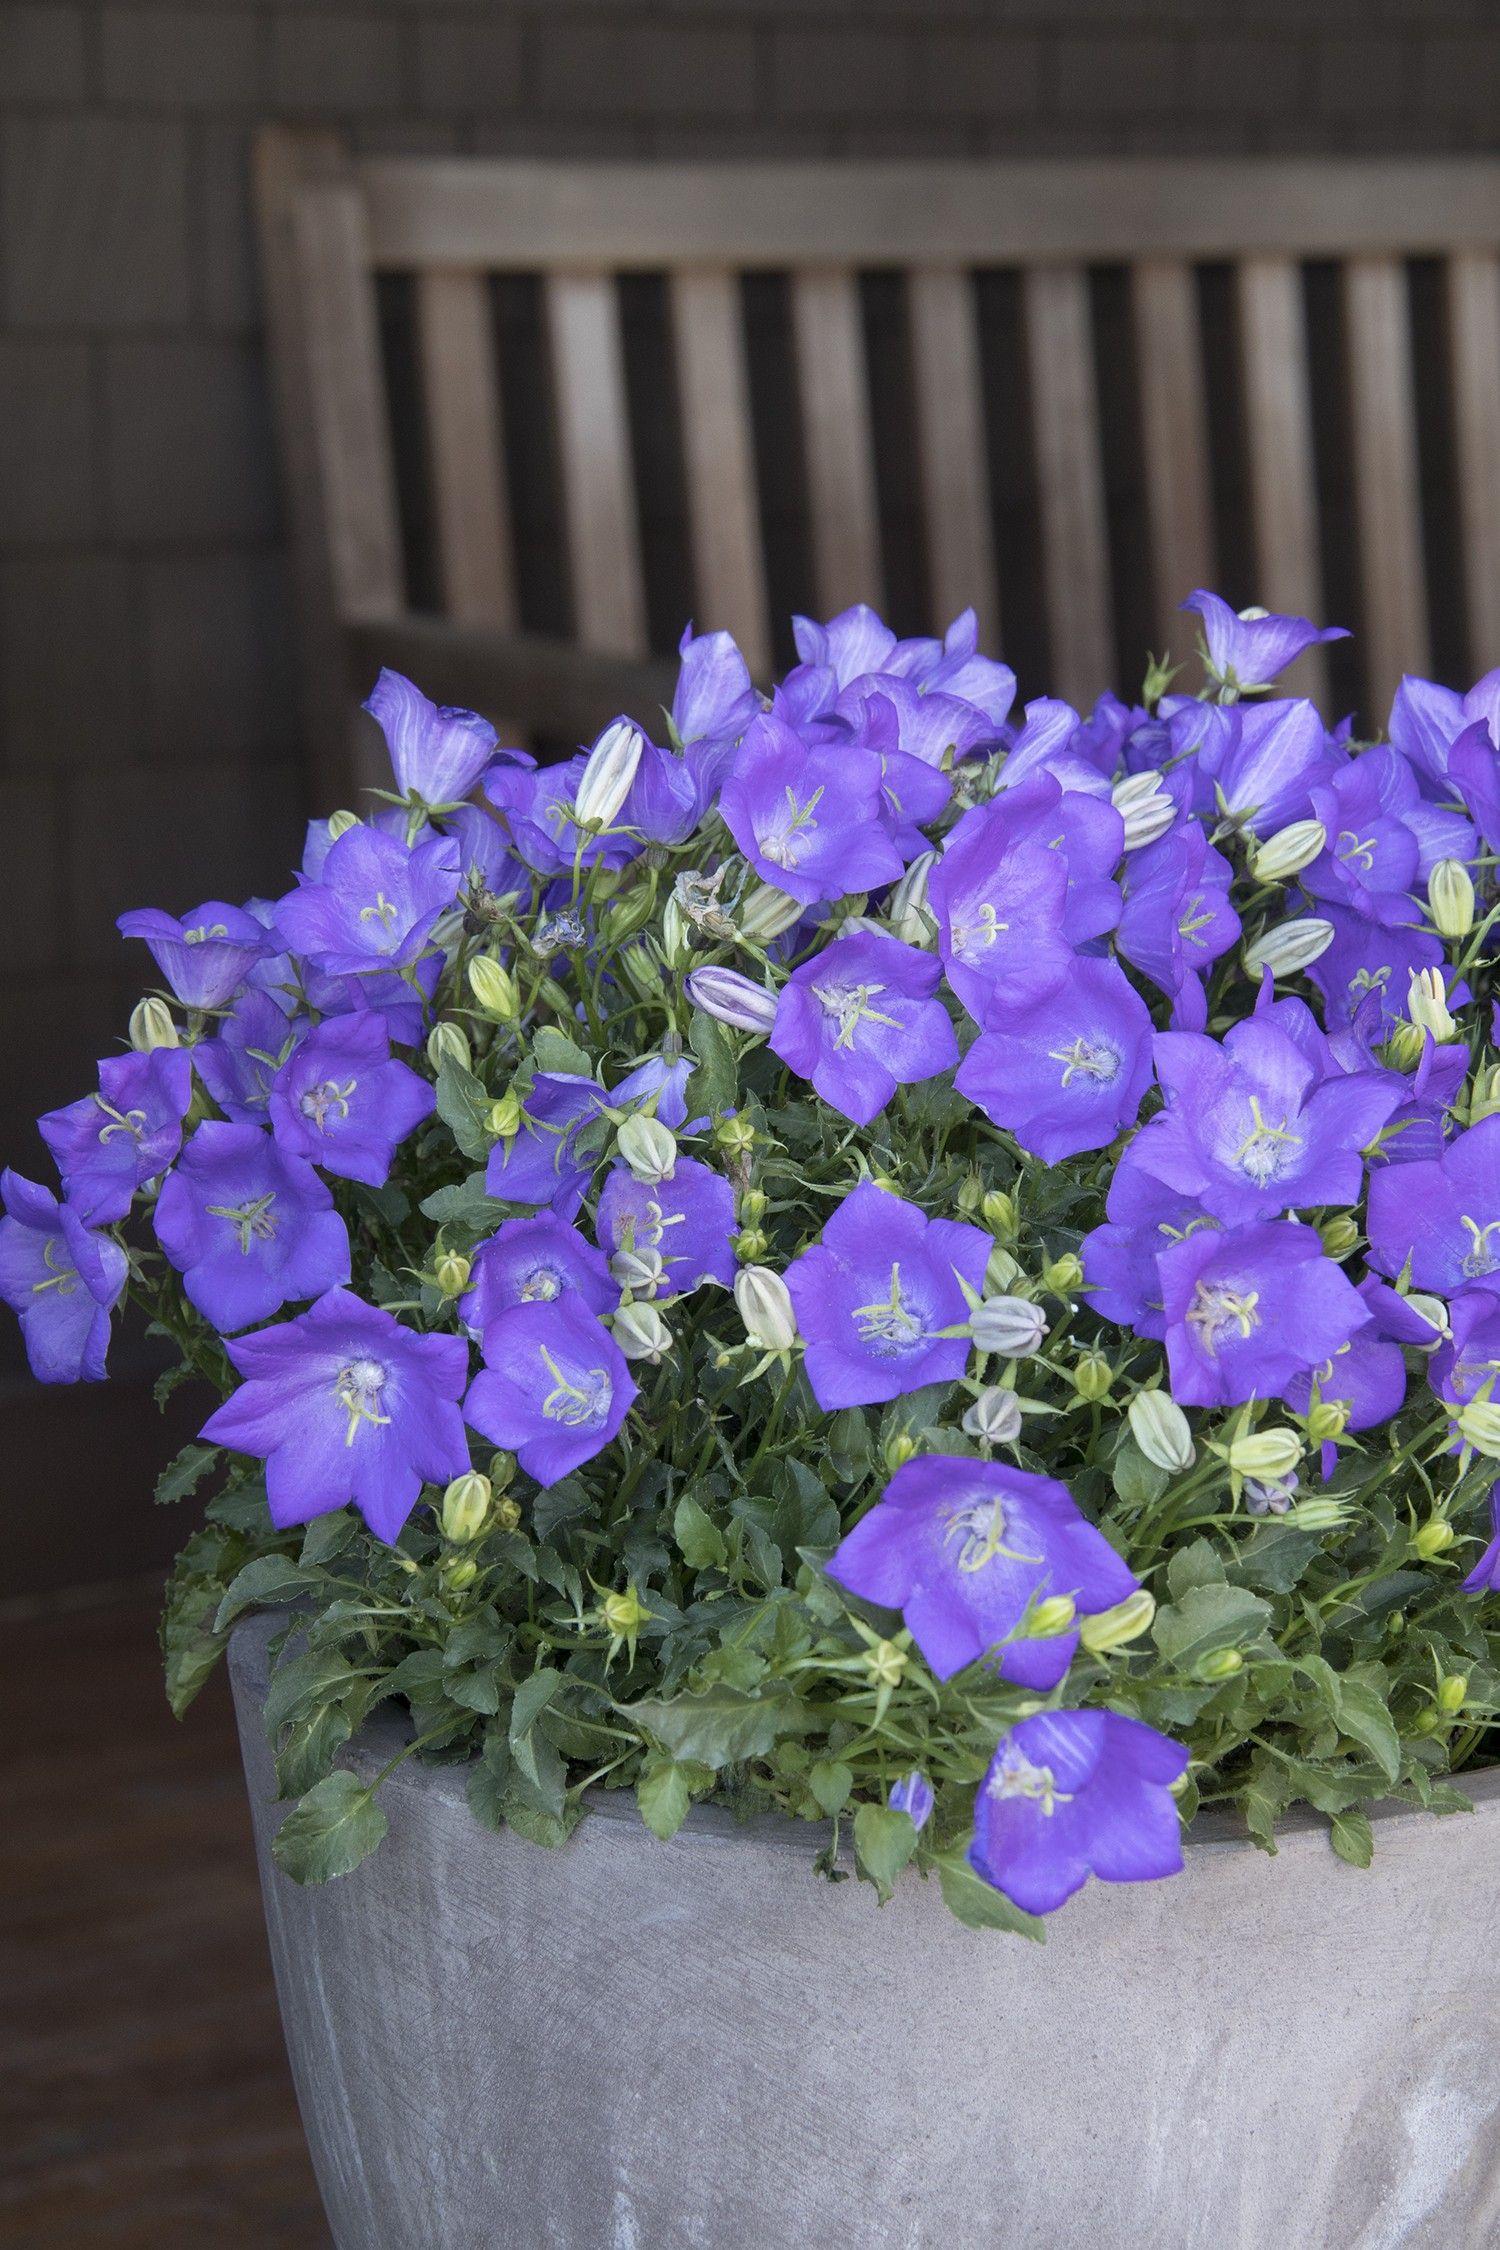 Top 10 stunning flowers that grow in shades shade flowers plants top 10 stunning flowers that grow in shades izmirmasajfo